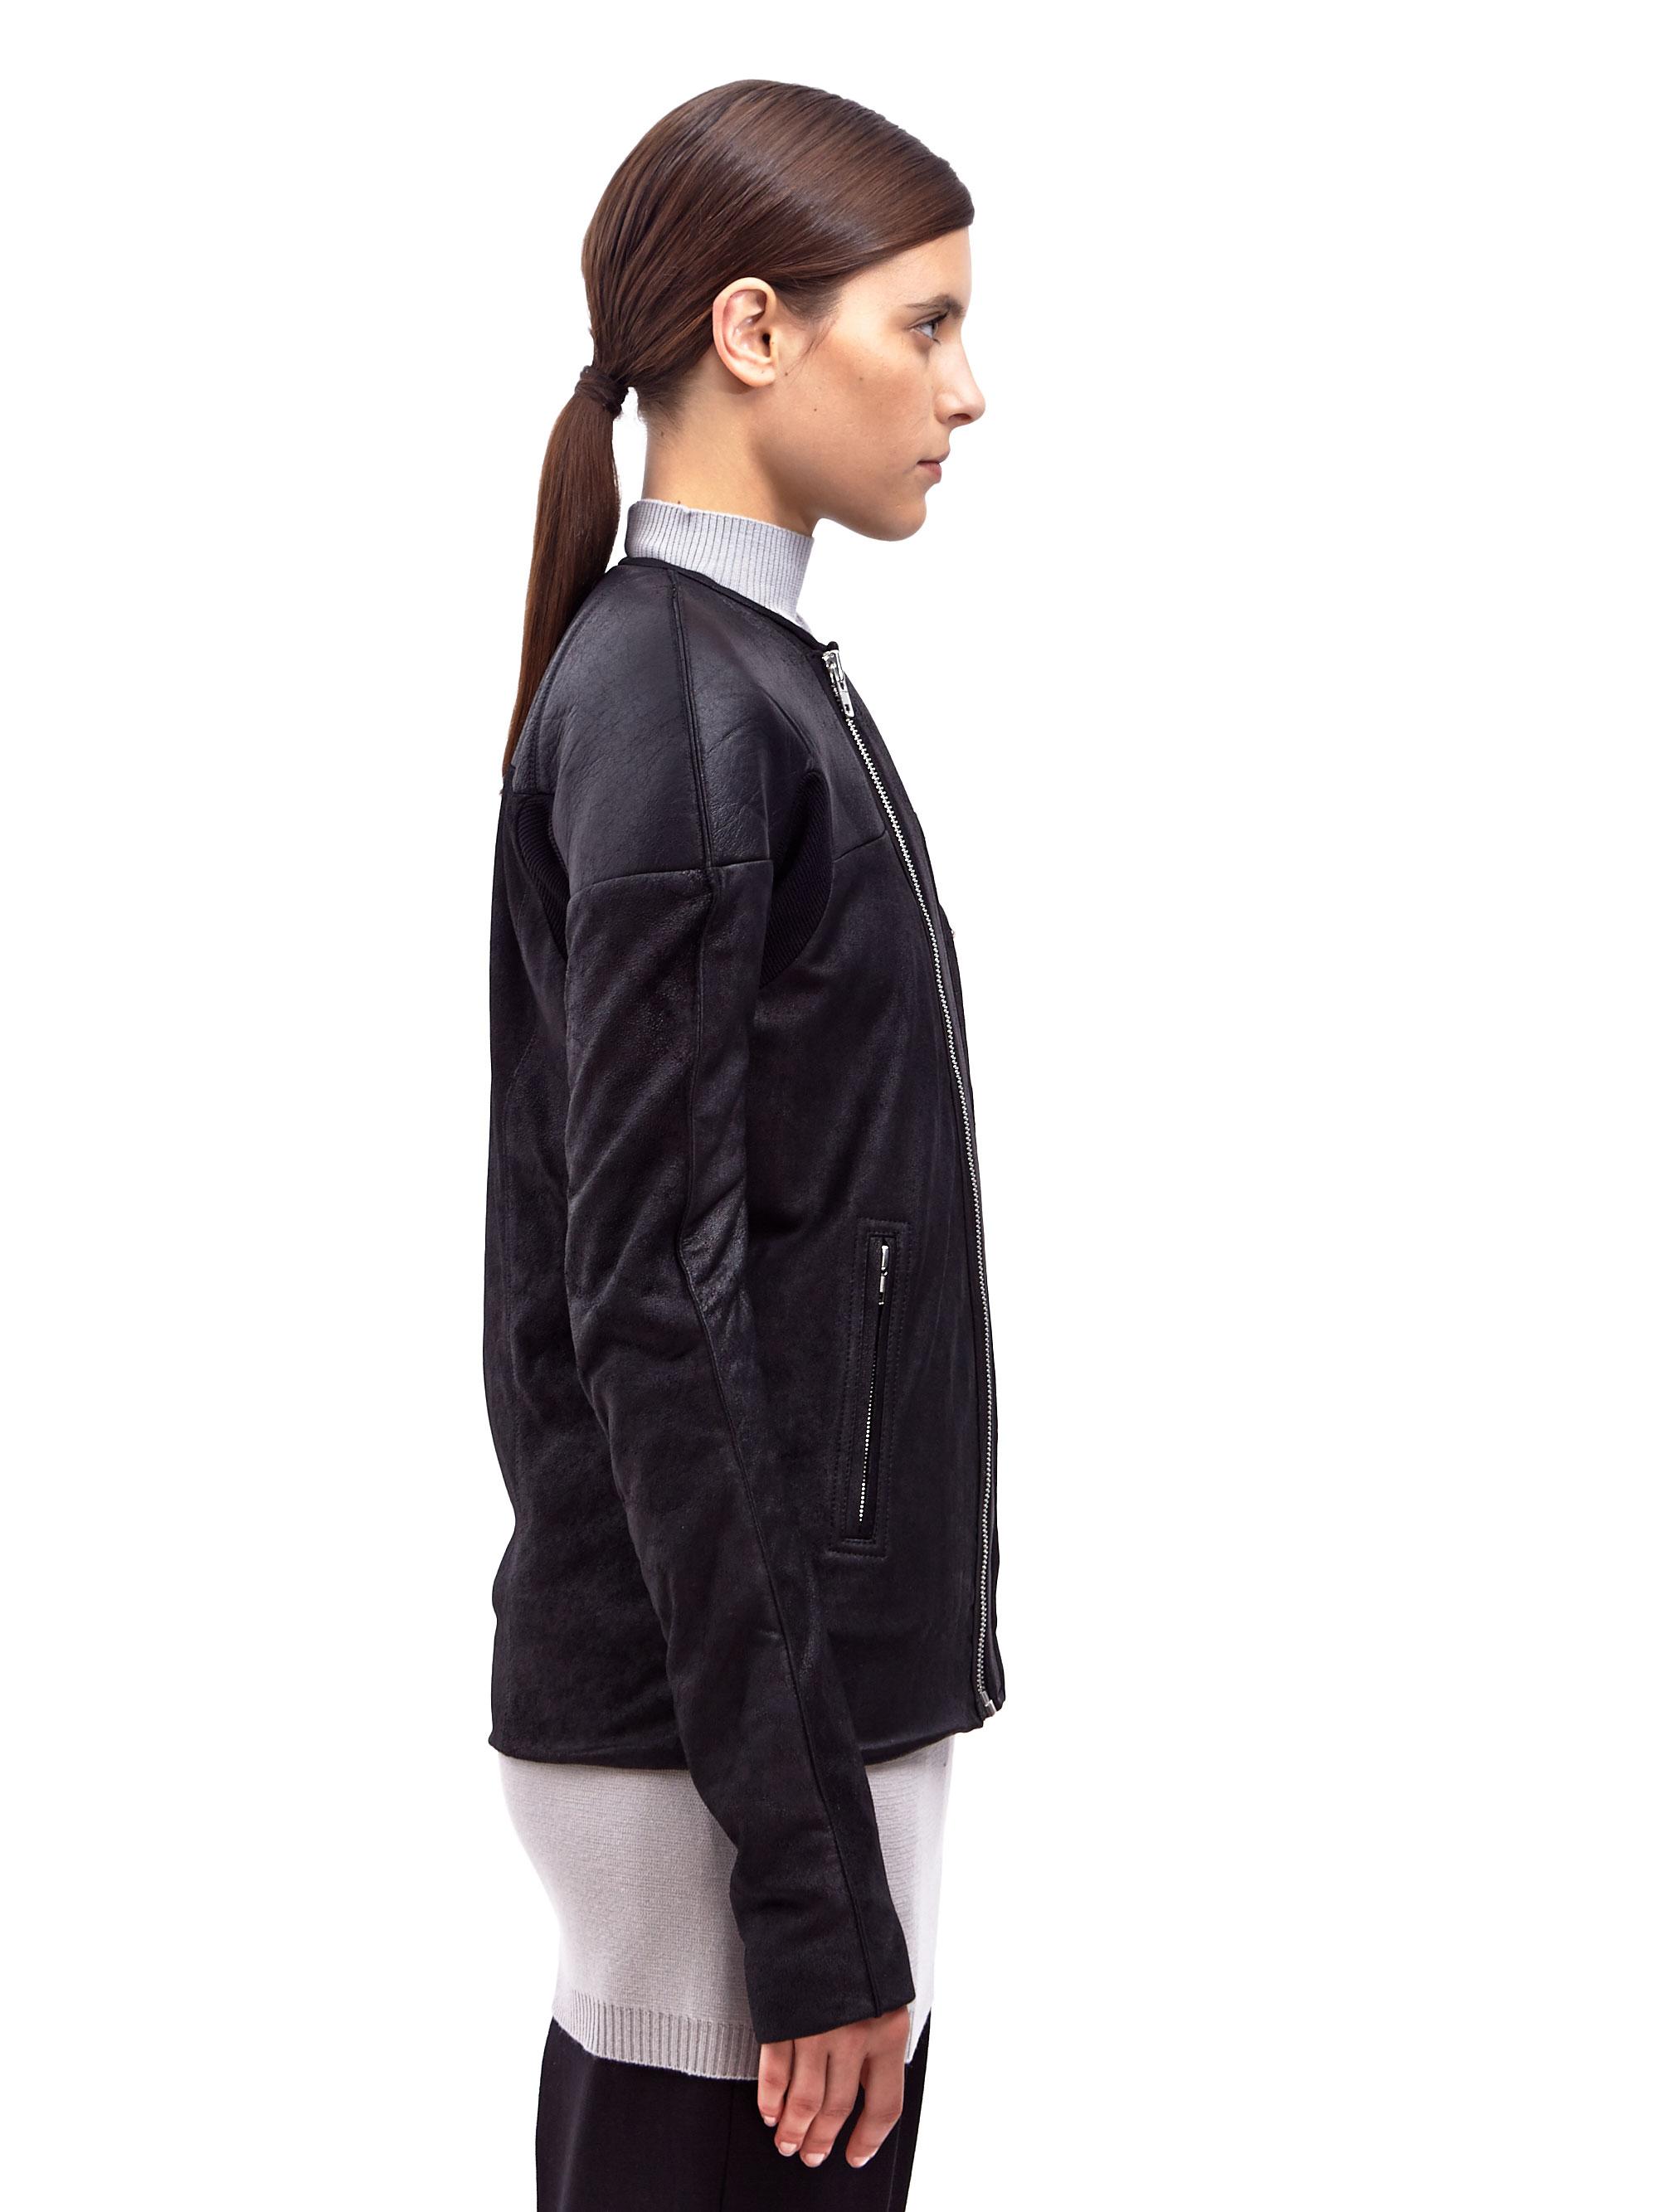 Rick owens womens jacket